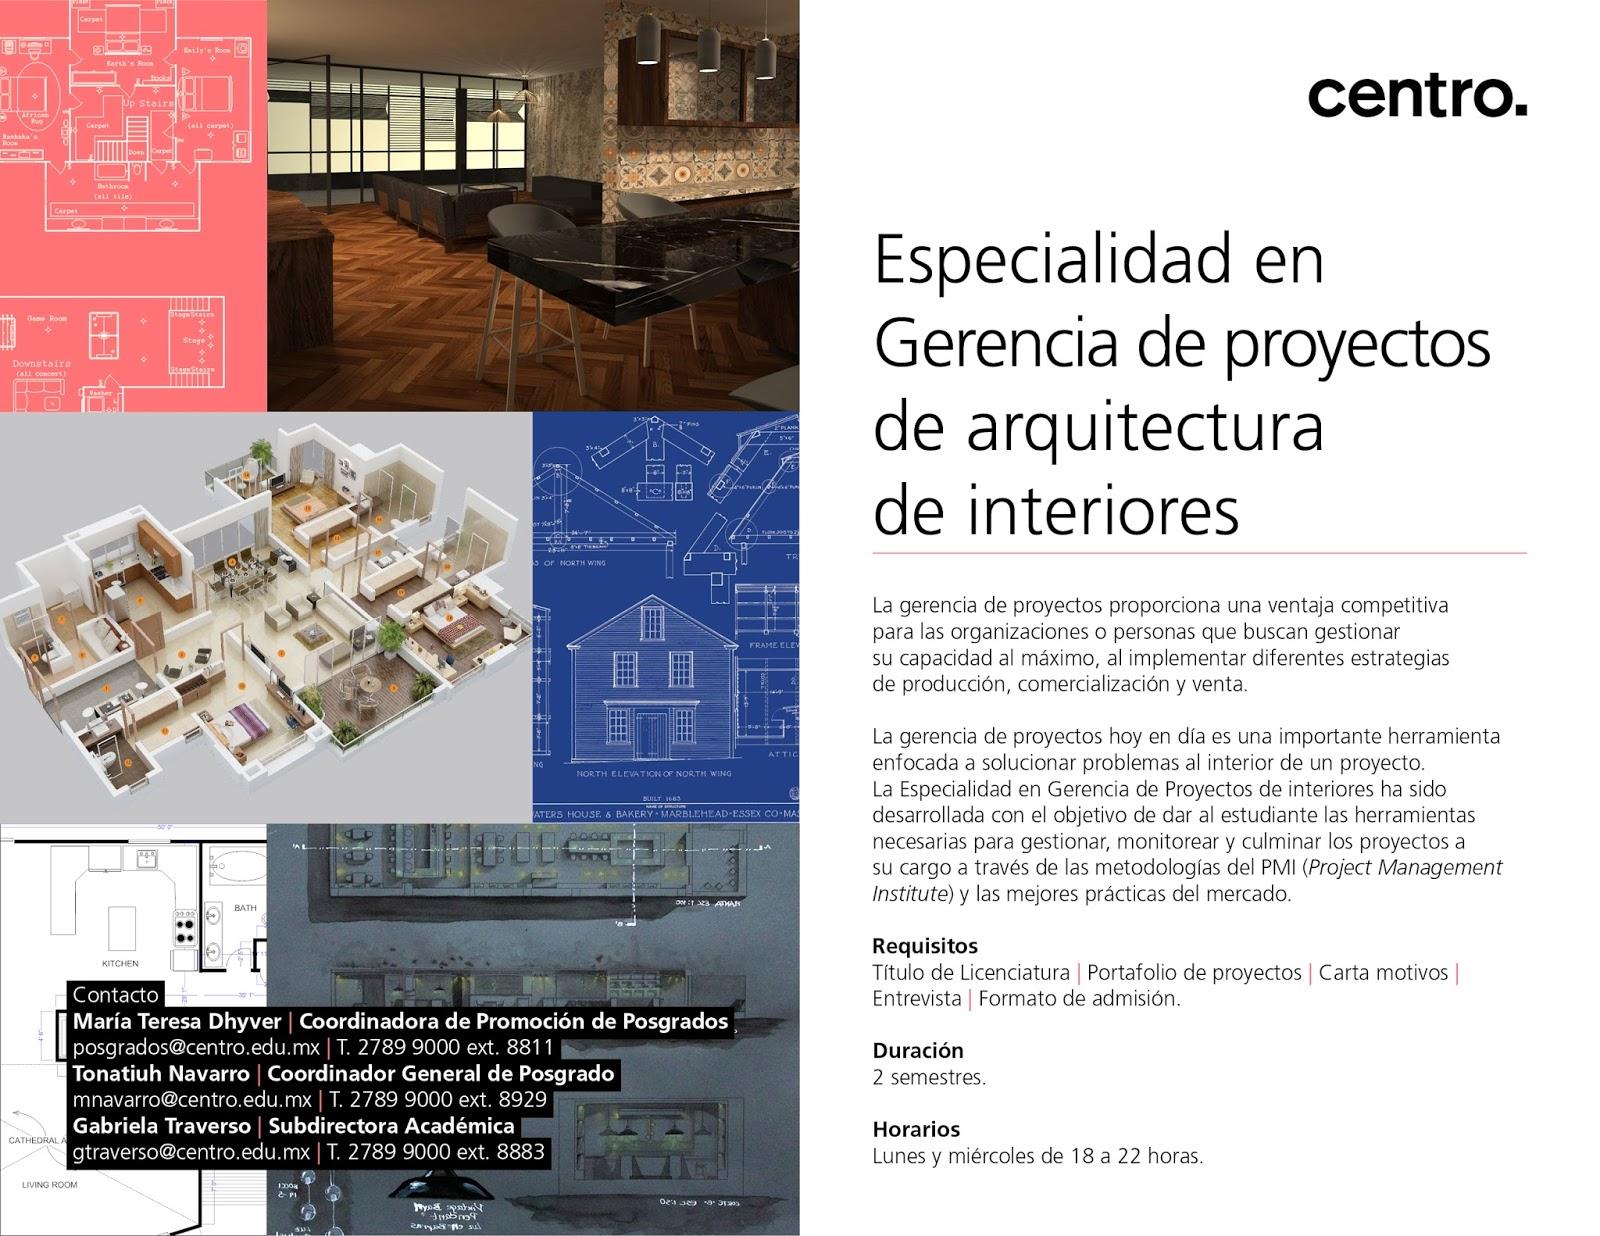 Consejo iberoamericano de dise adores de interiores a c for Consejos de diseno de interiores